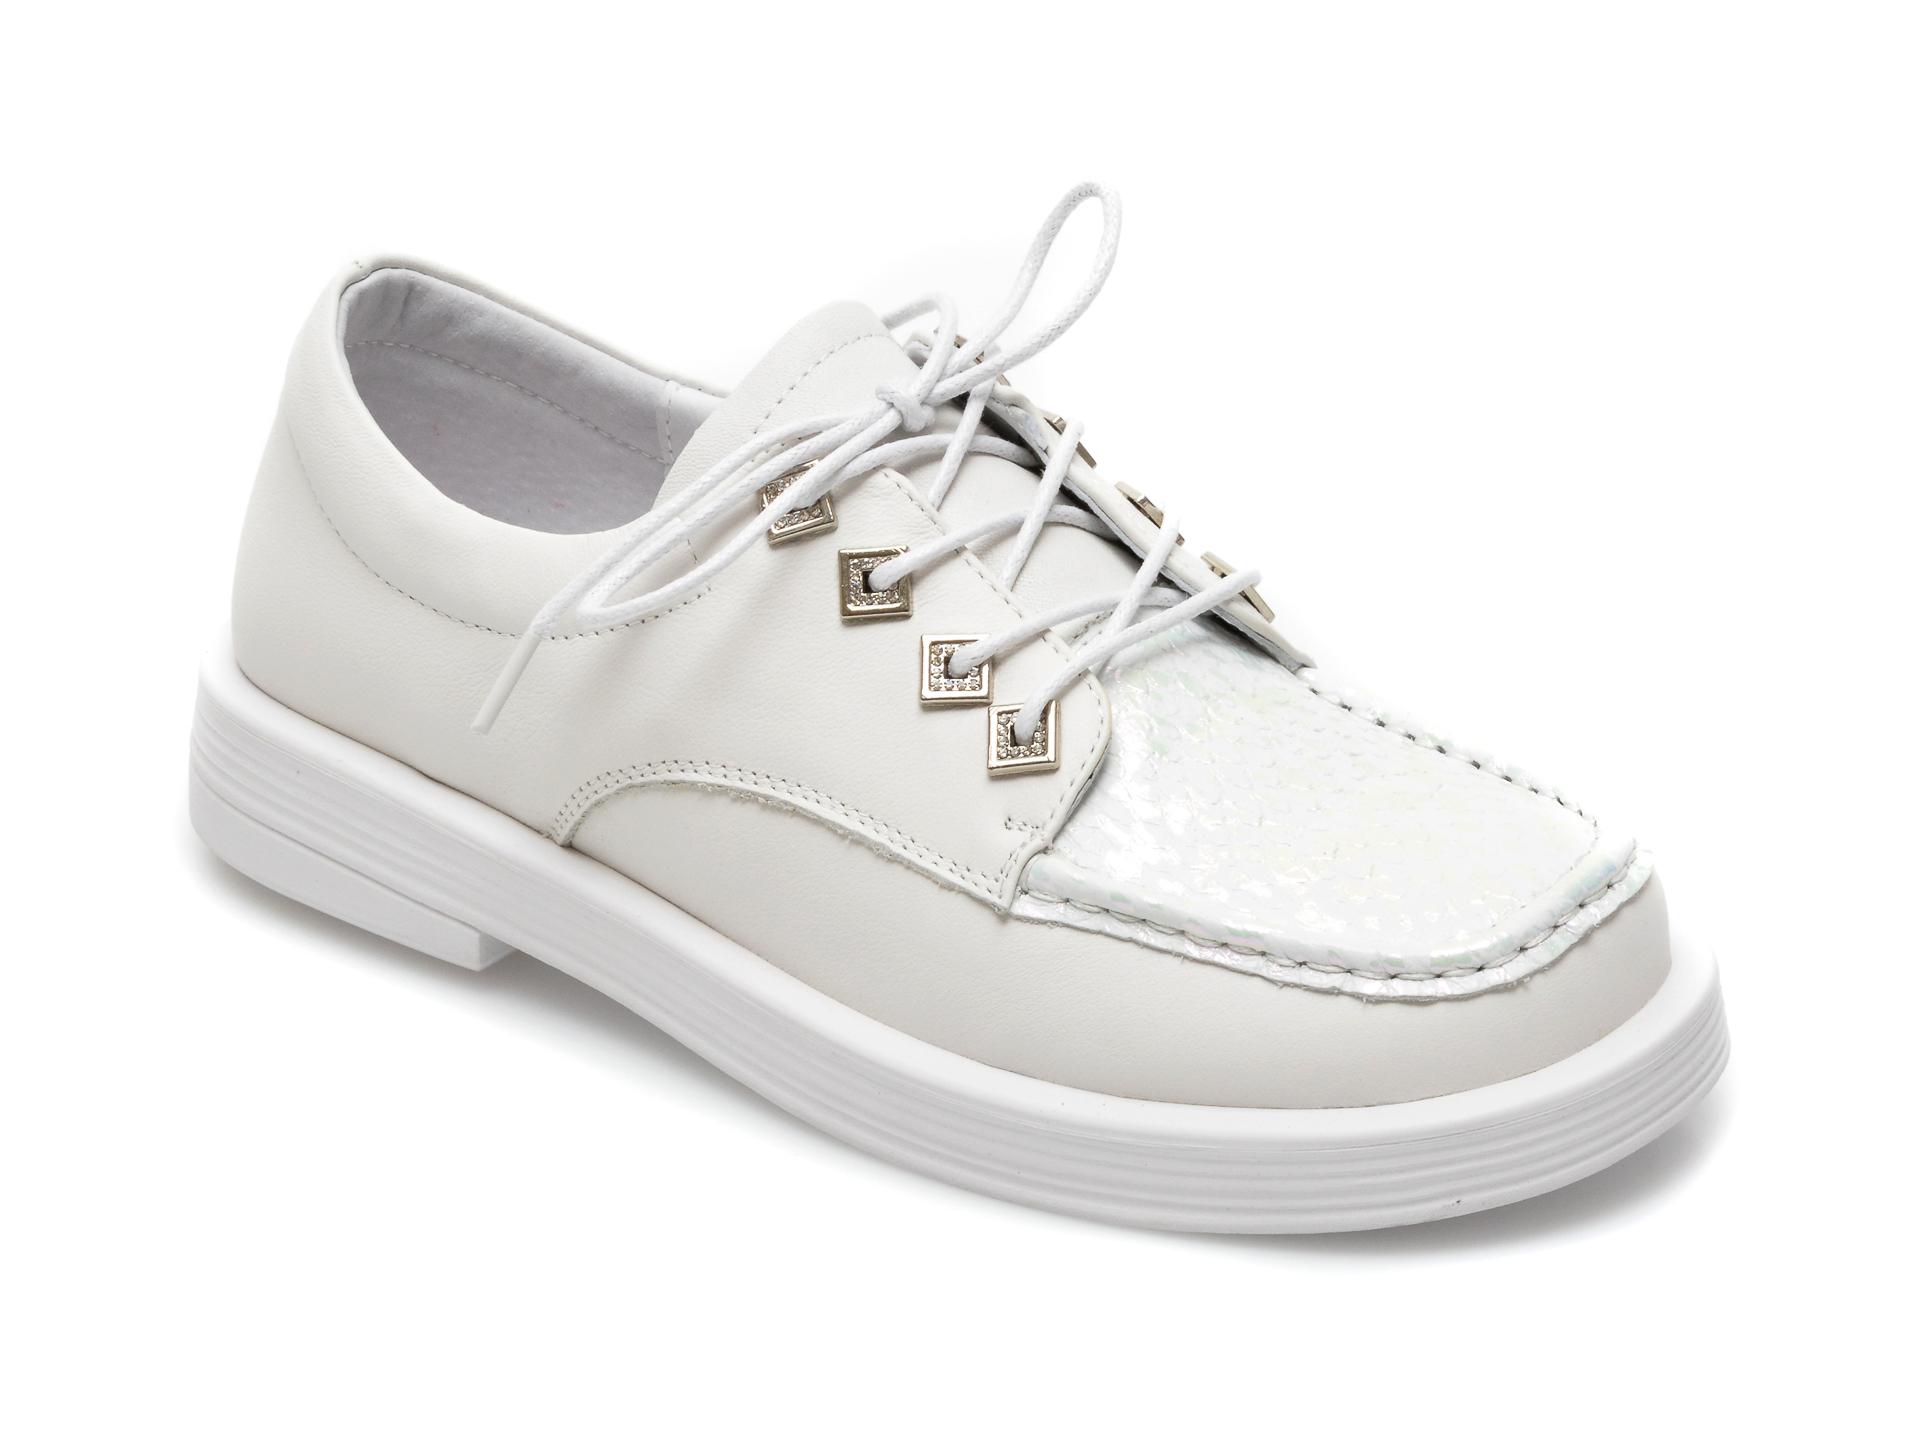 Pantofi GRYXX albi, A21158, din piele naturala imagine otter.ro 2021